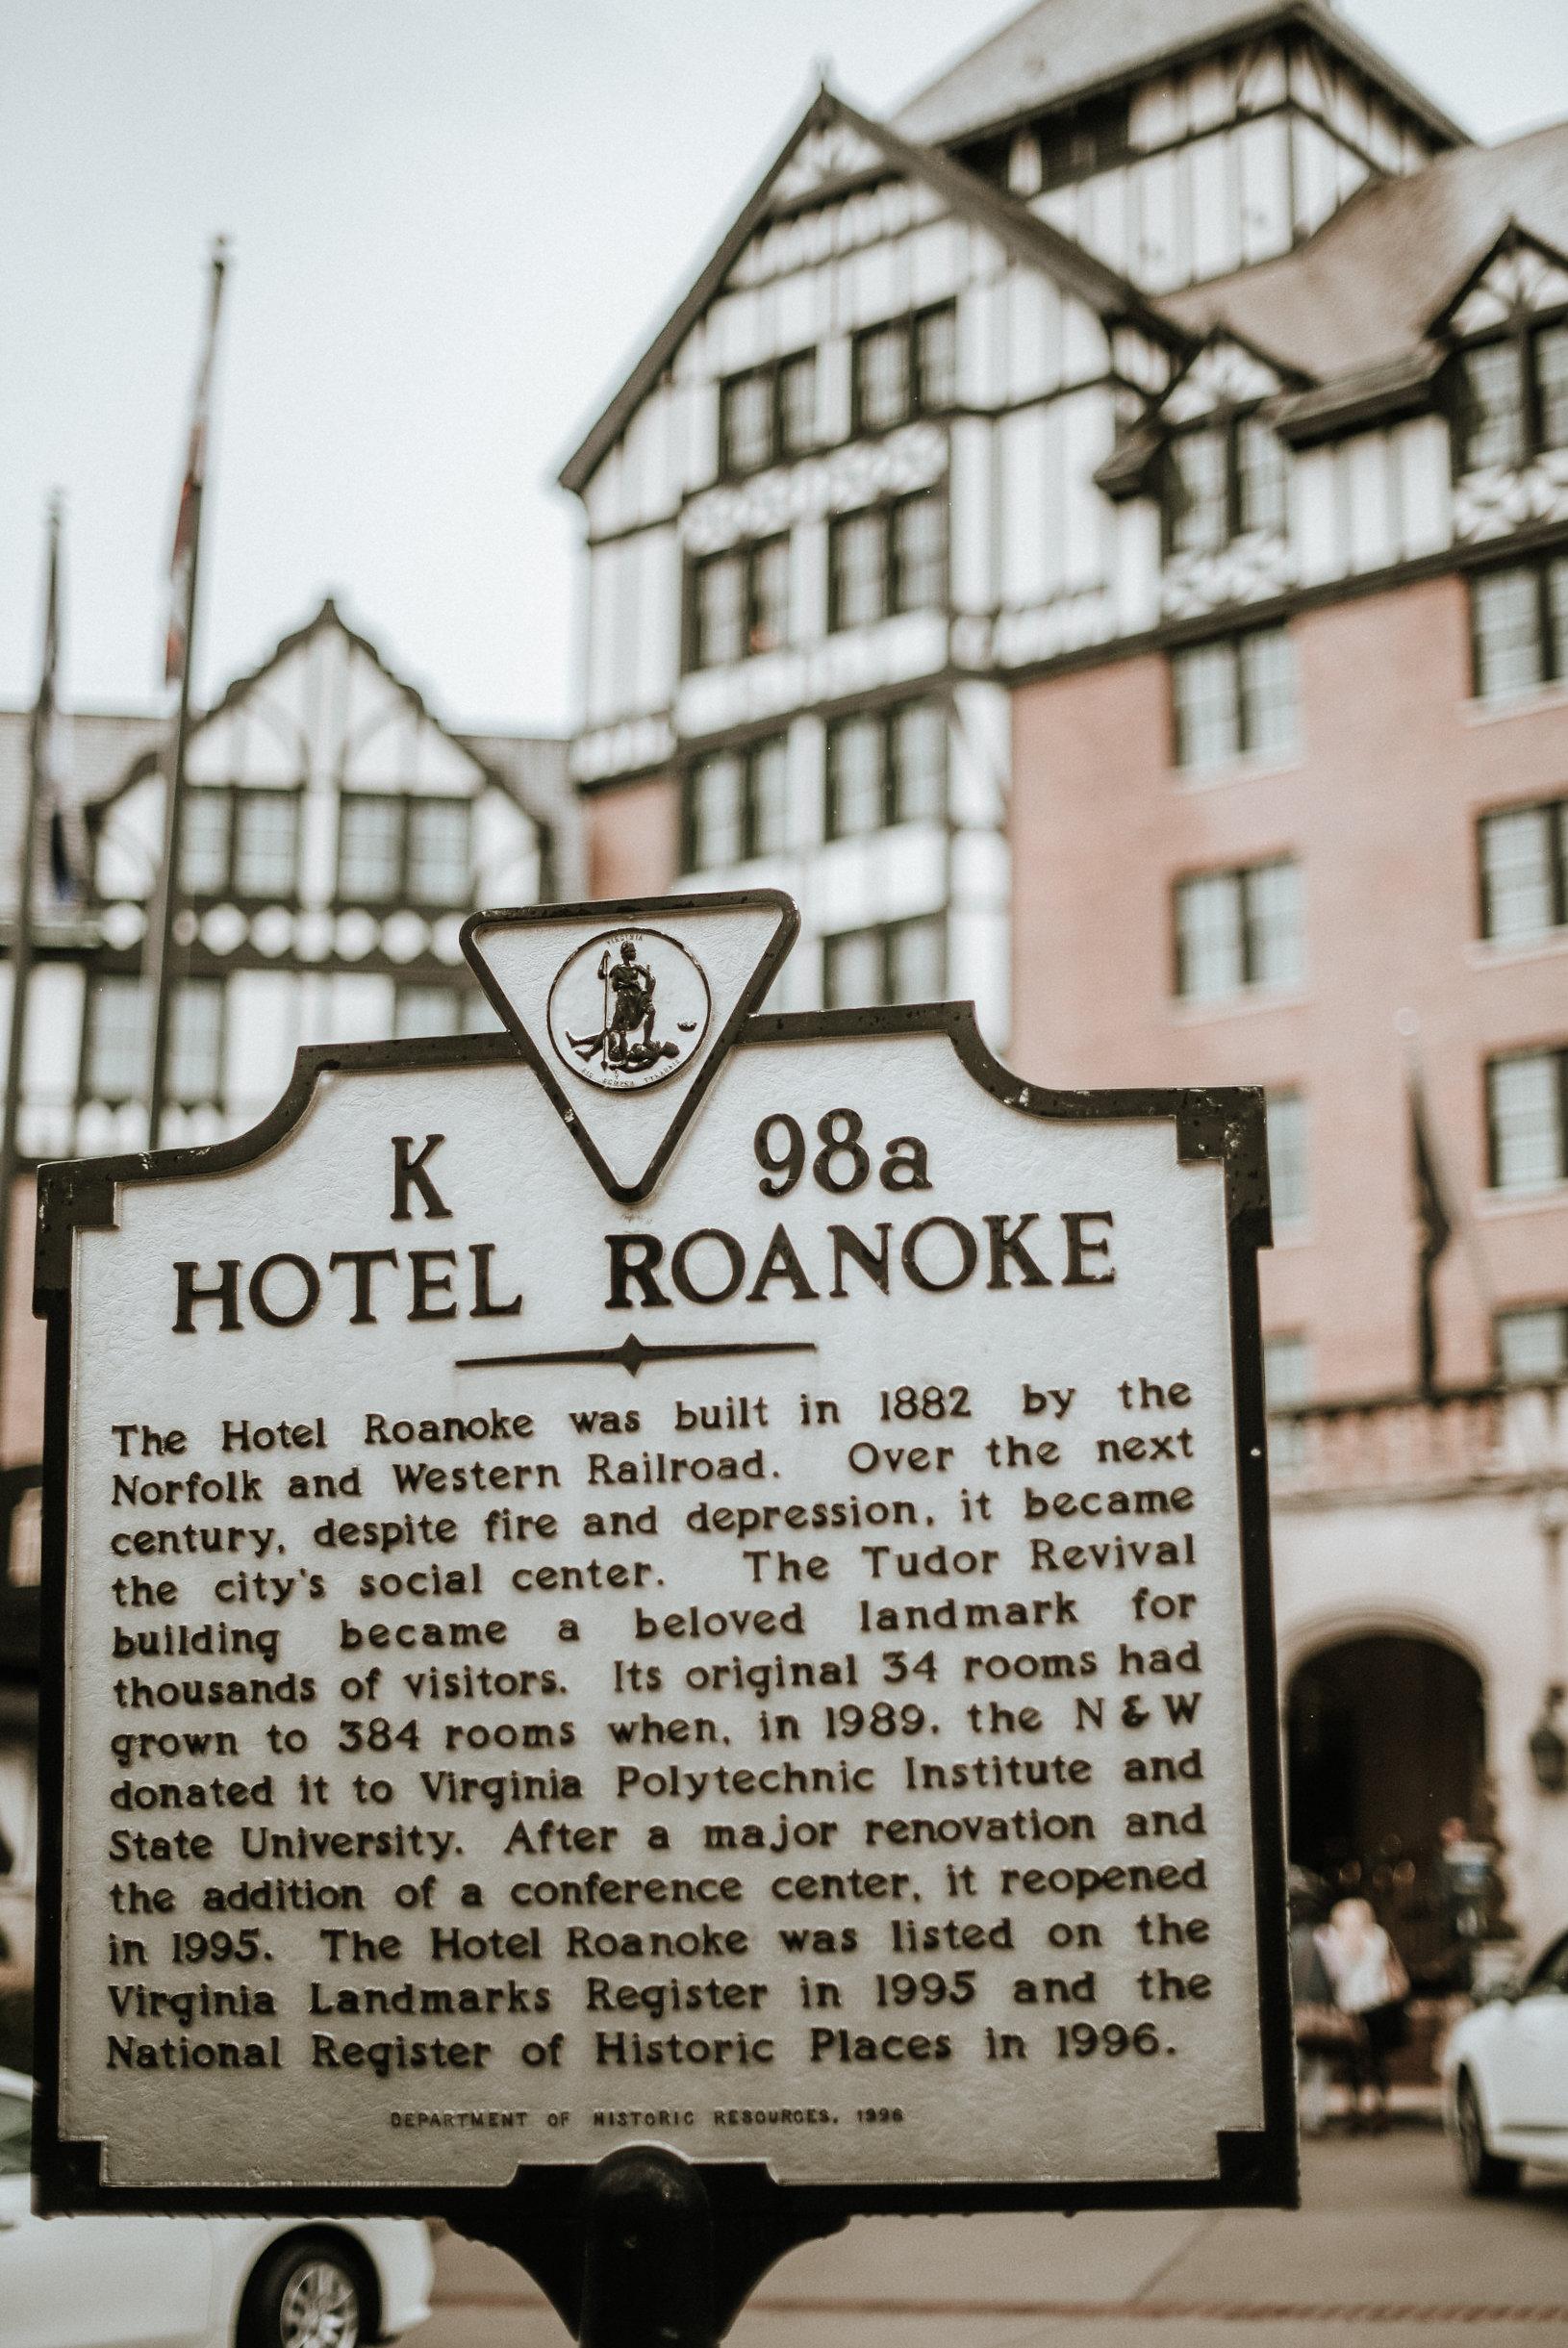 Hotel Roanoke historic marker